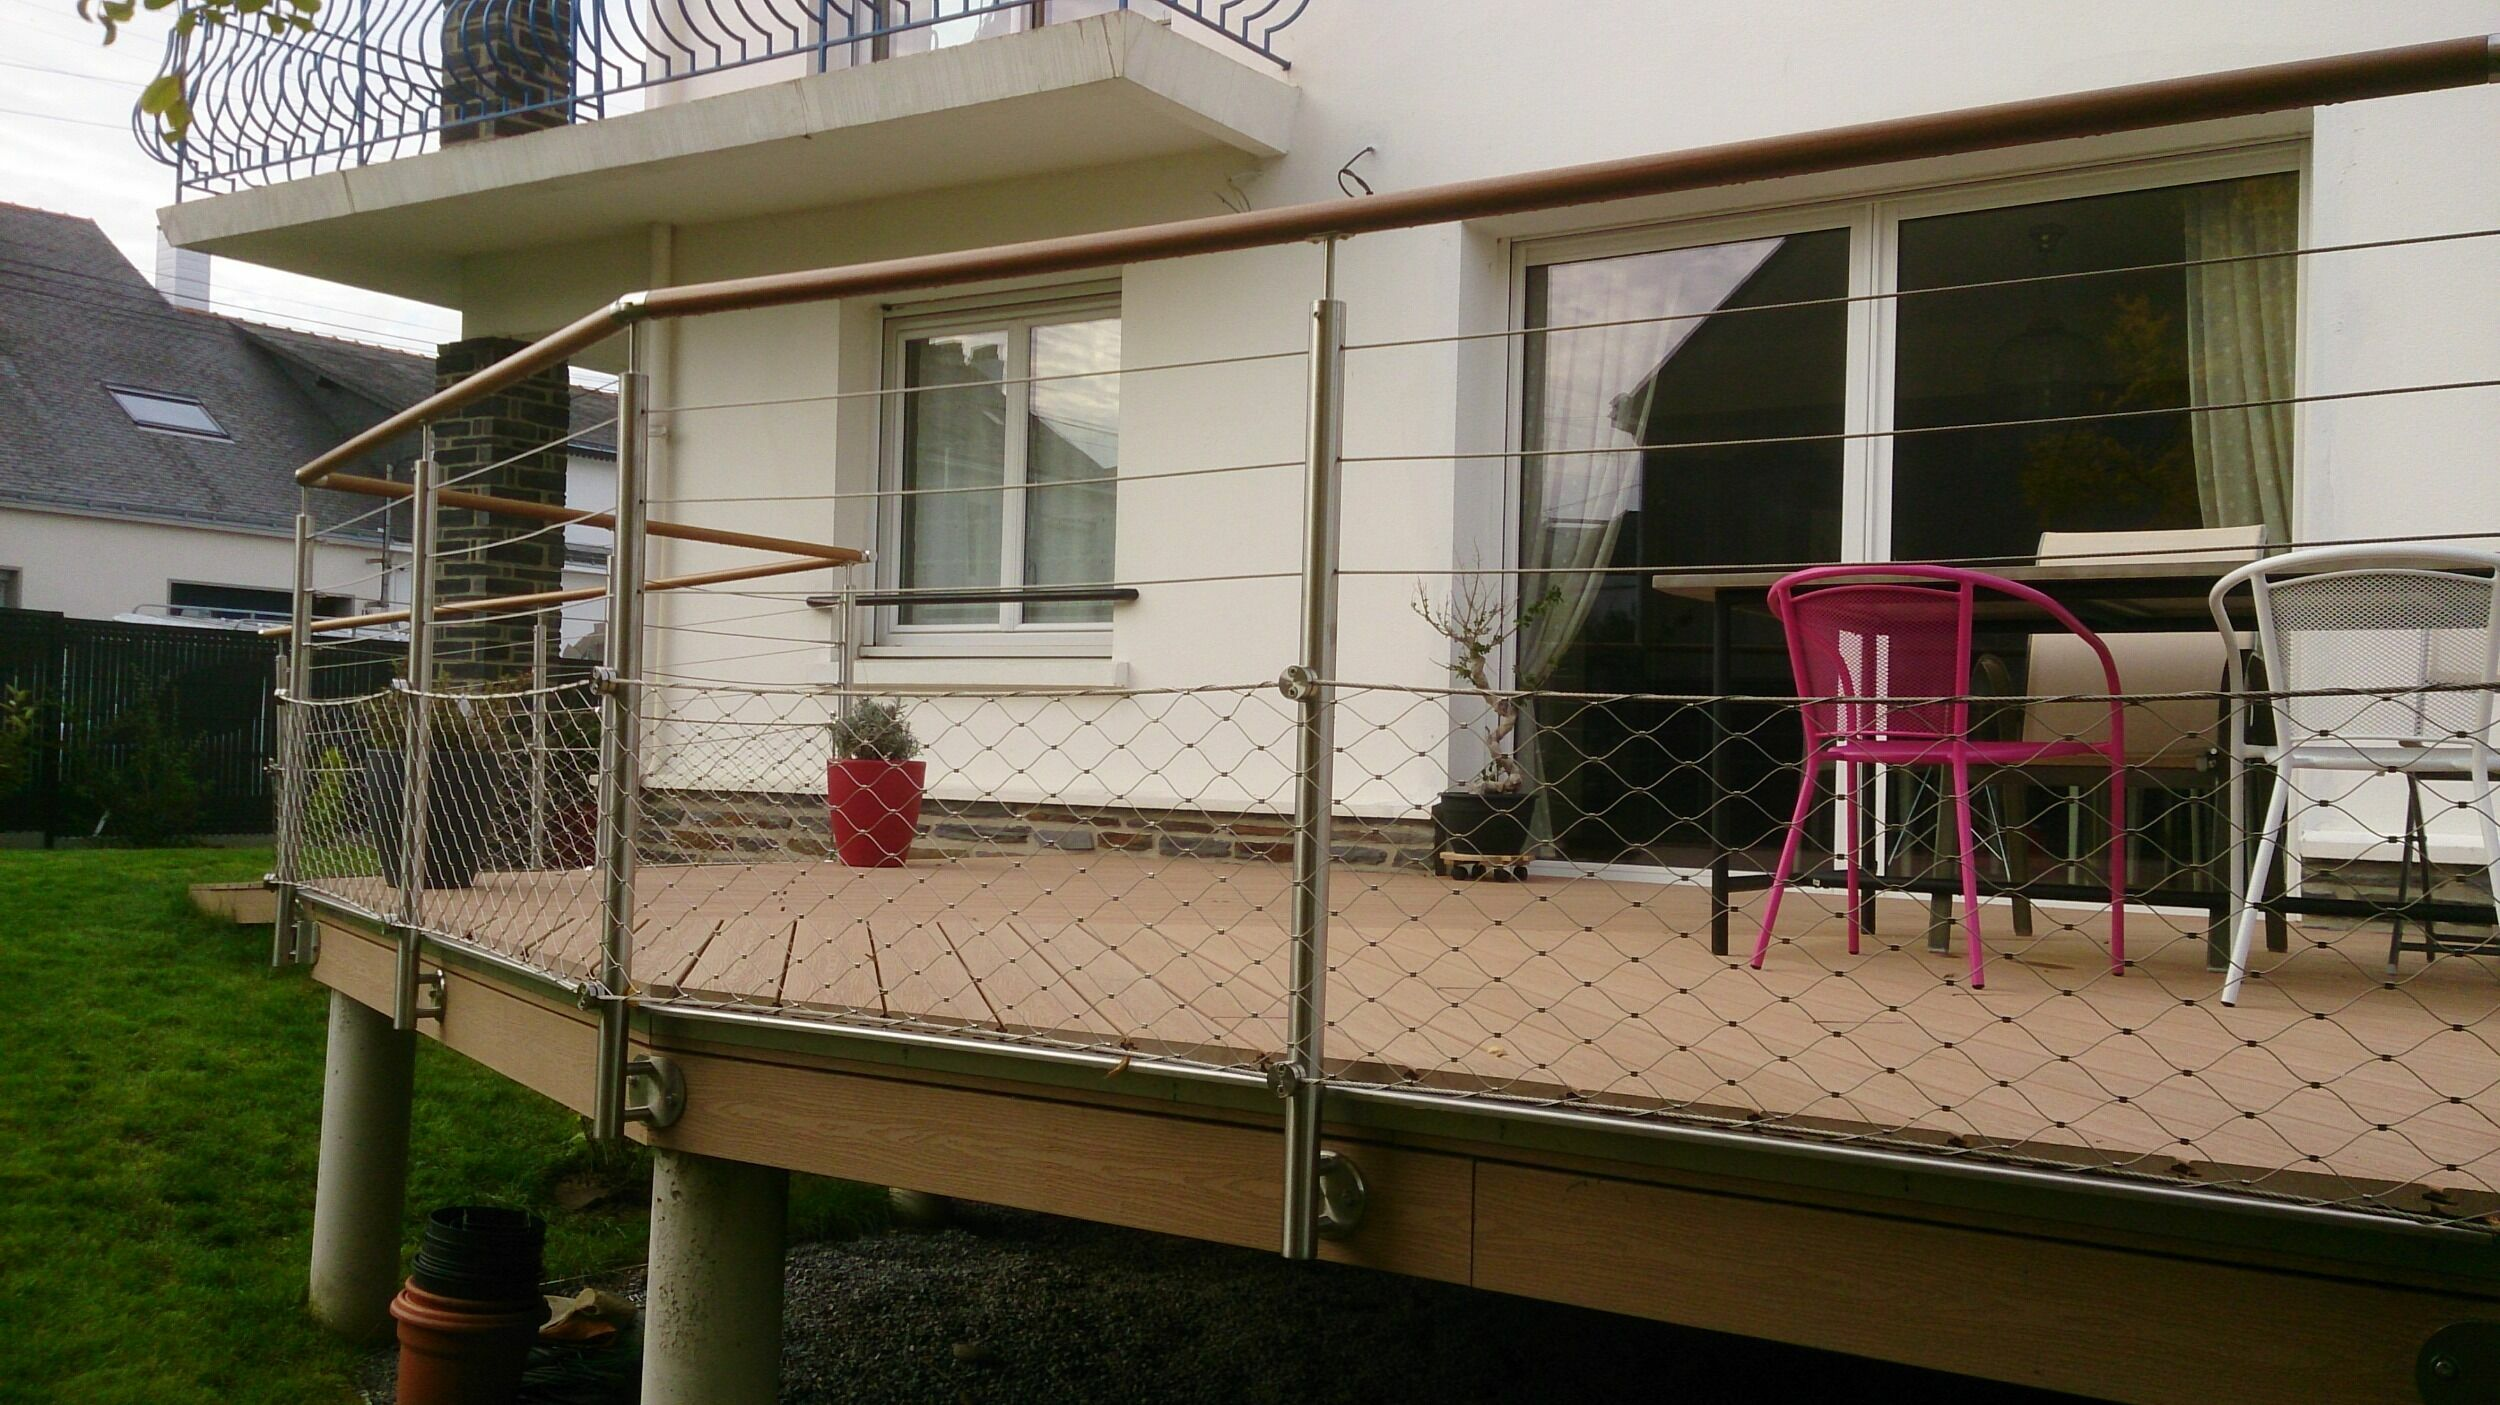 garde corps terrasse en filet inox tid inox. Black Bedroom Furniture Sets. Home Design Ideas